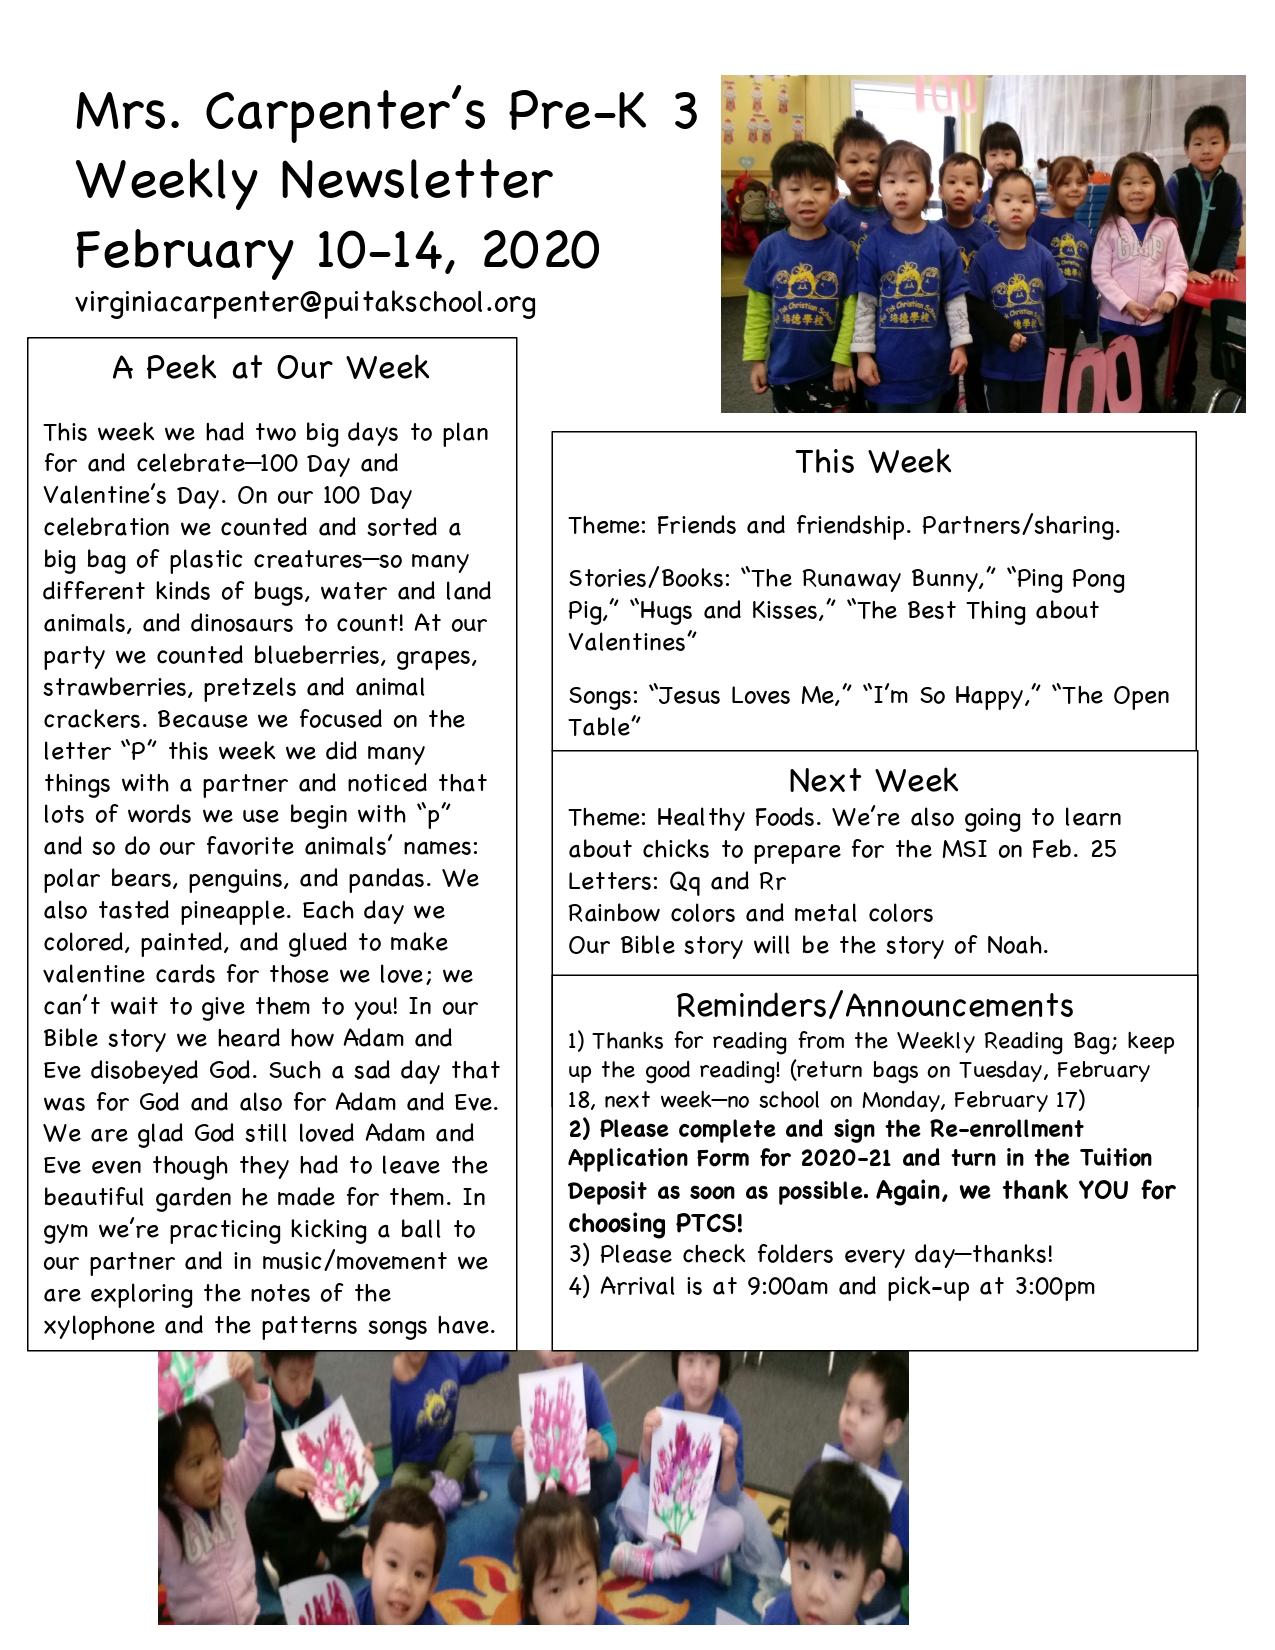 GinnyNewsletter2020February2ndWeek_page-